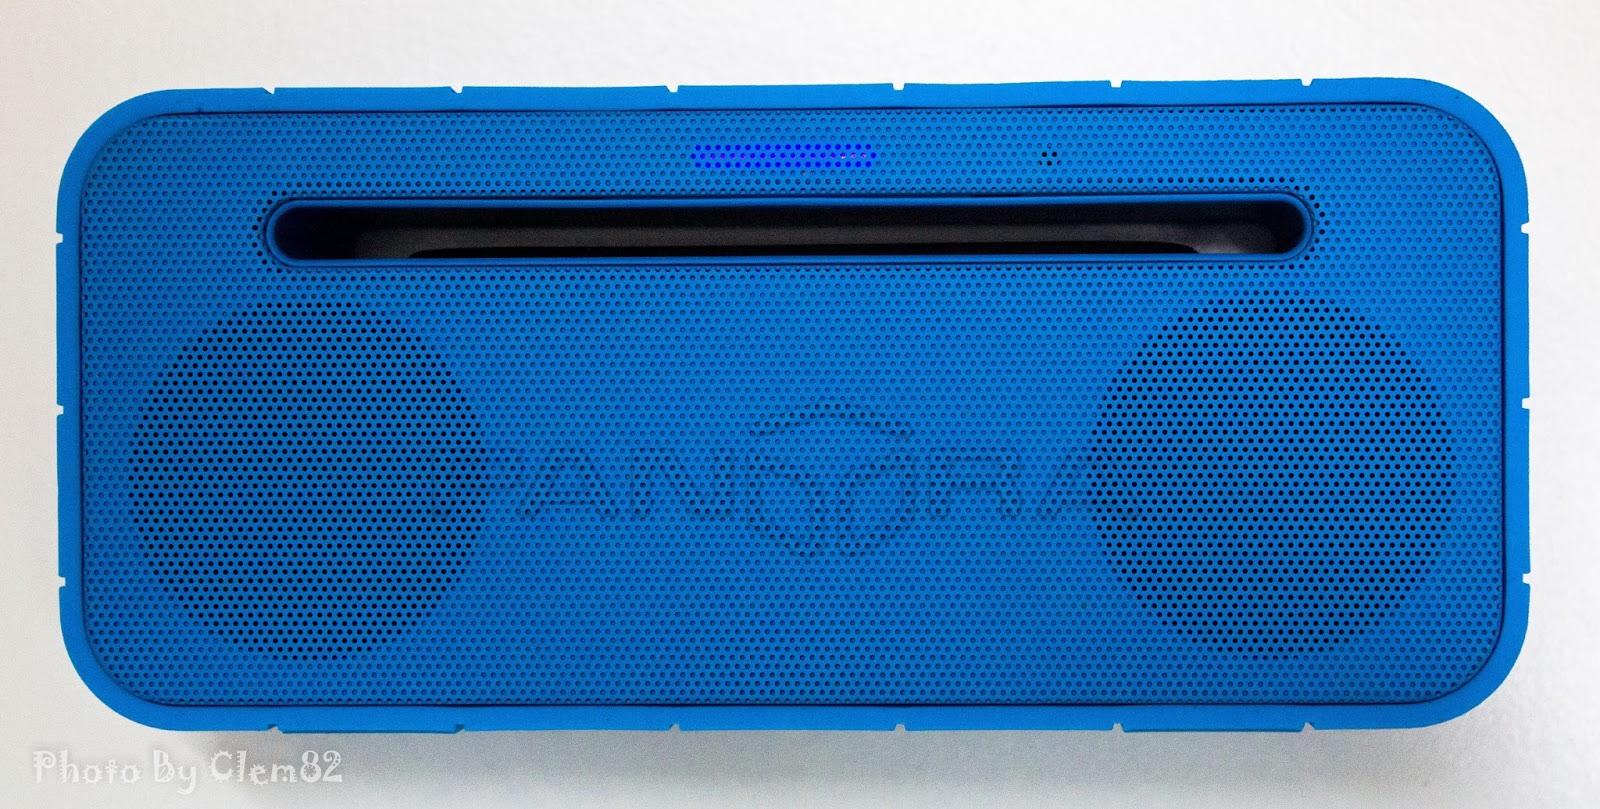 Opening Pandora's Box: SonicGear Pandora Wireless Bluetooth Media Player Series 15